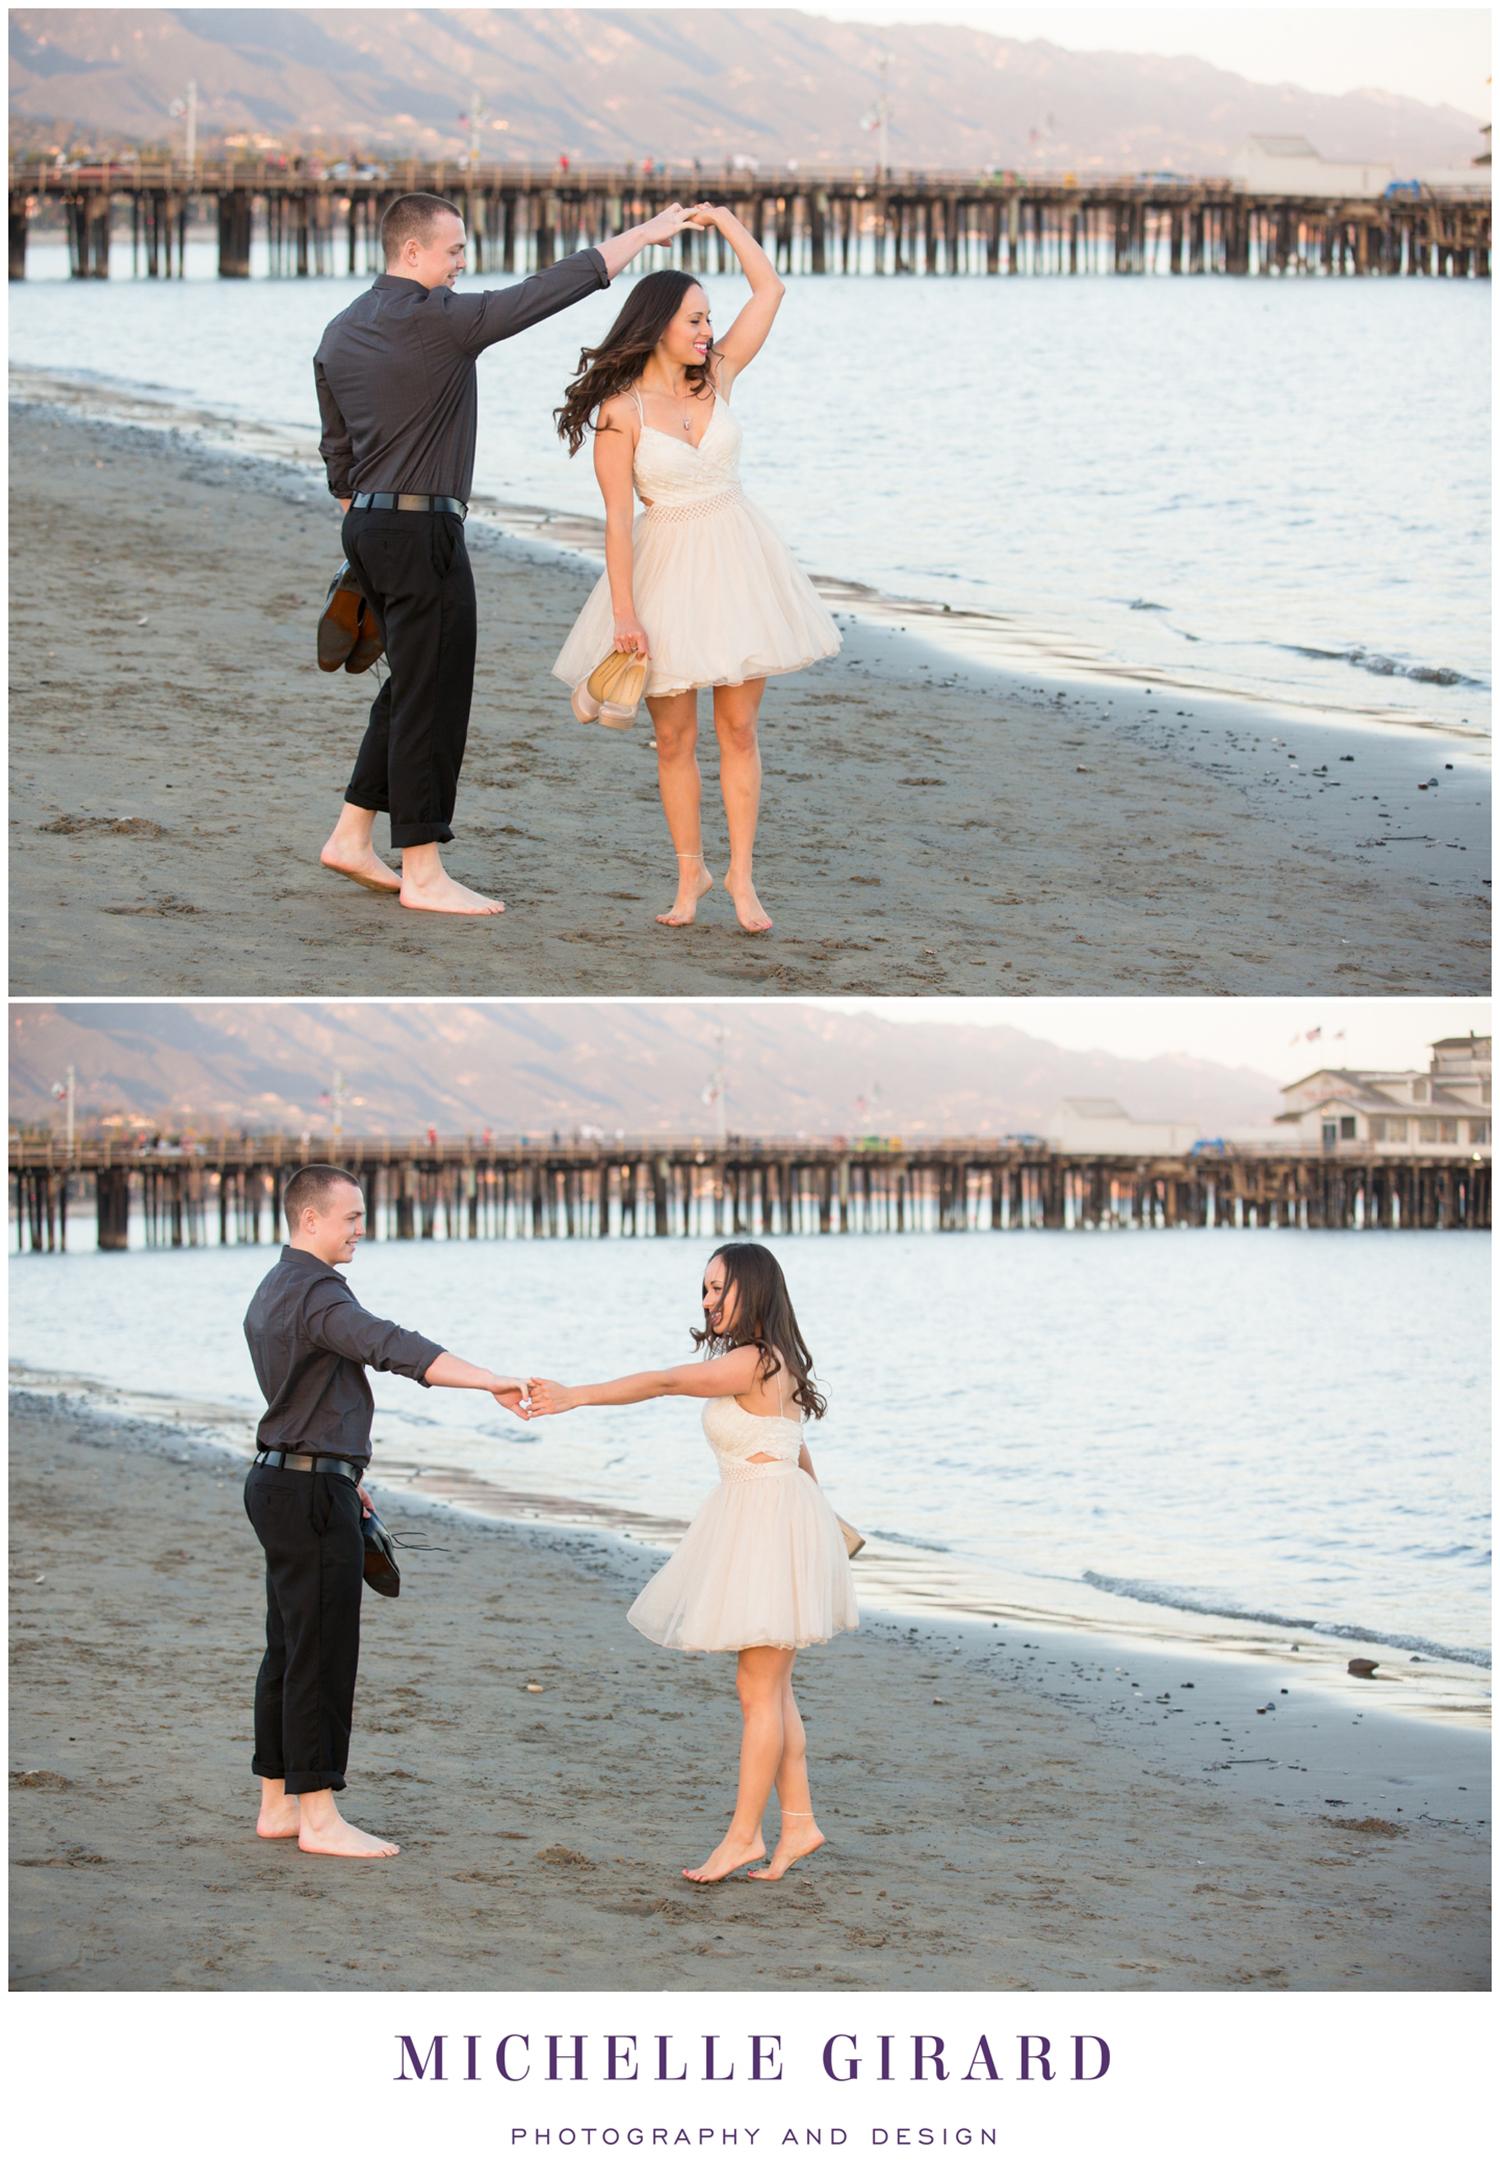 santa-barbara-sunset-beach-elopement-engagement-michelle-girard-photography-02.jpg